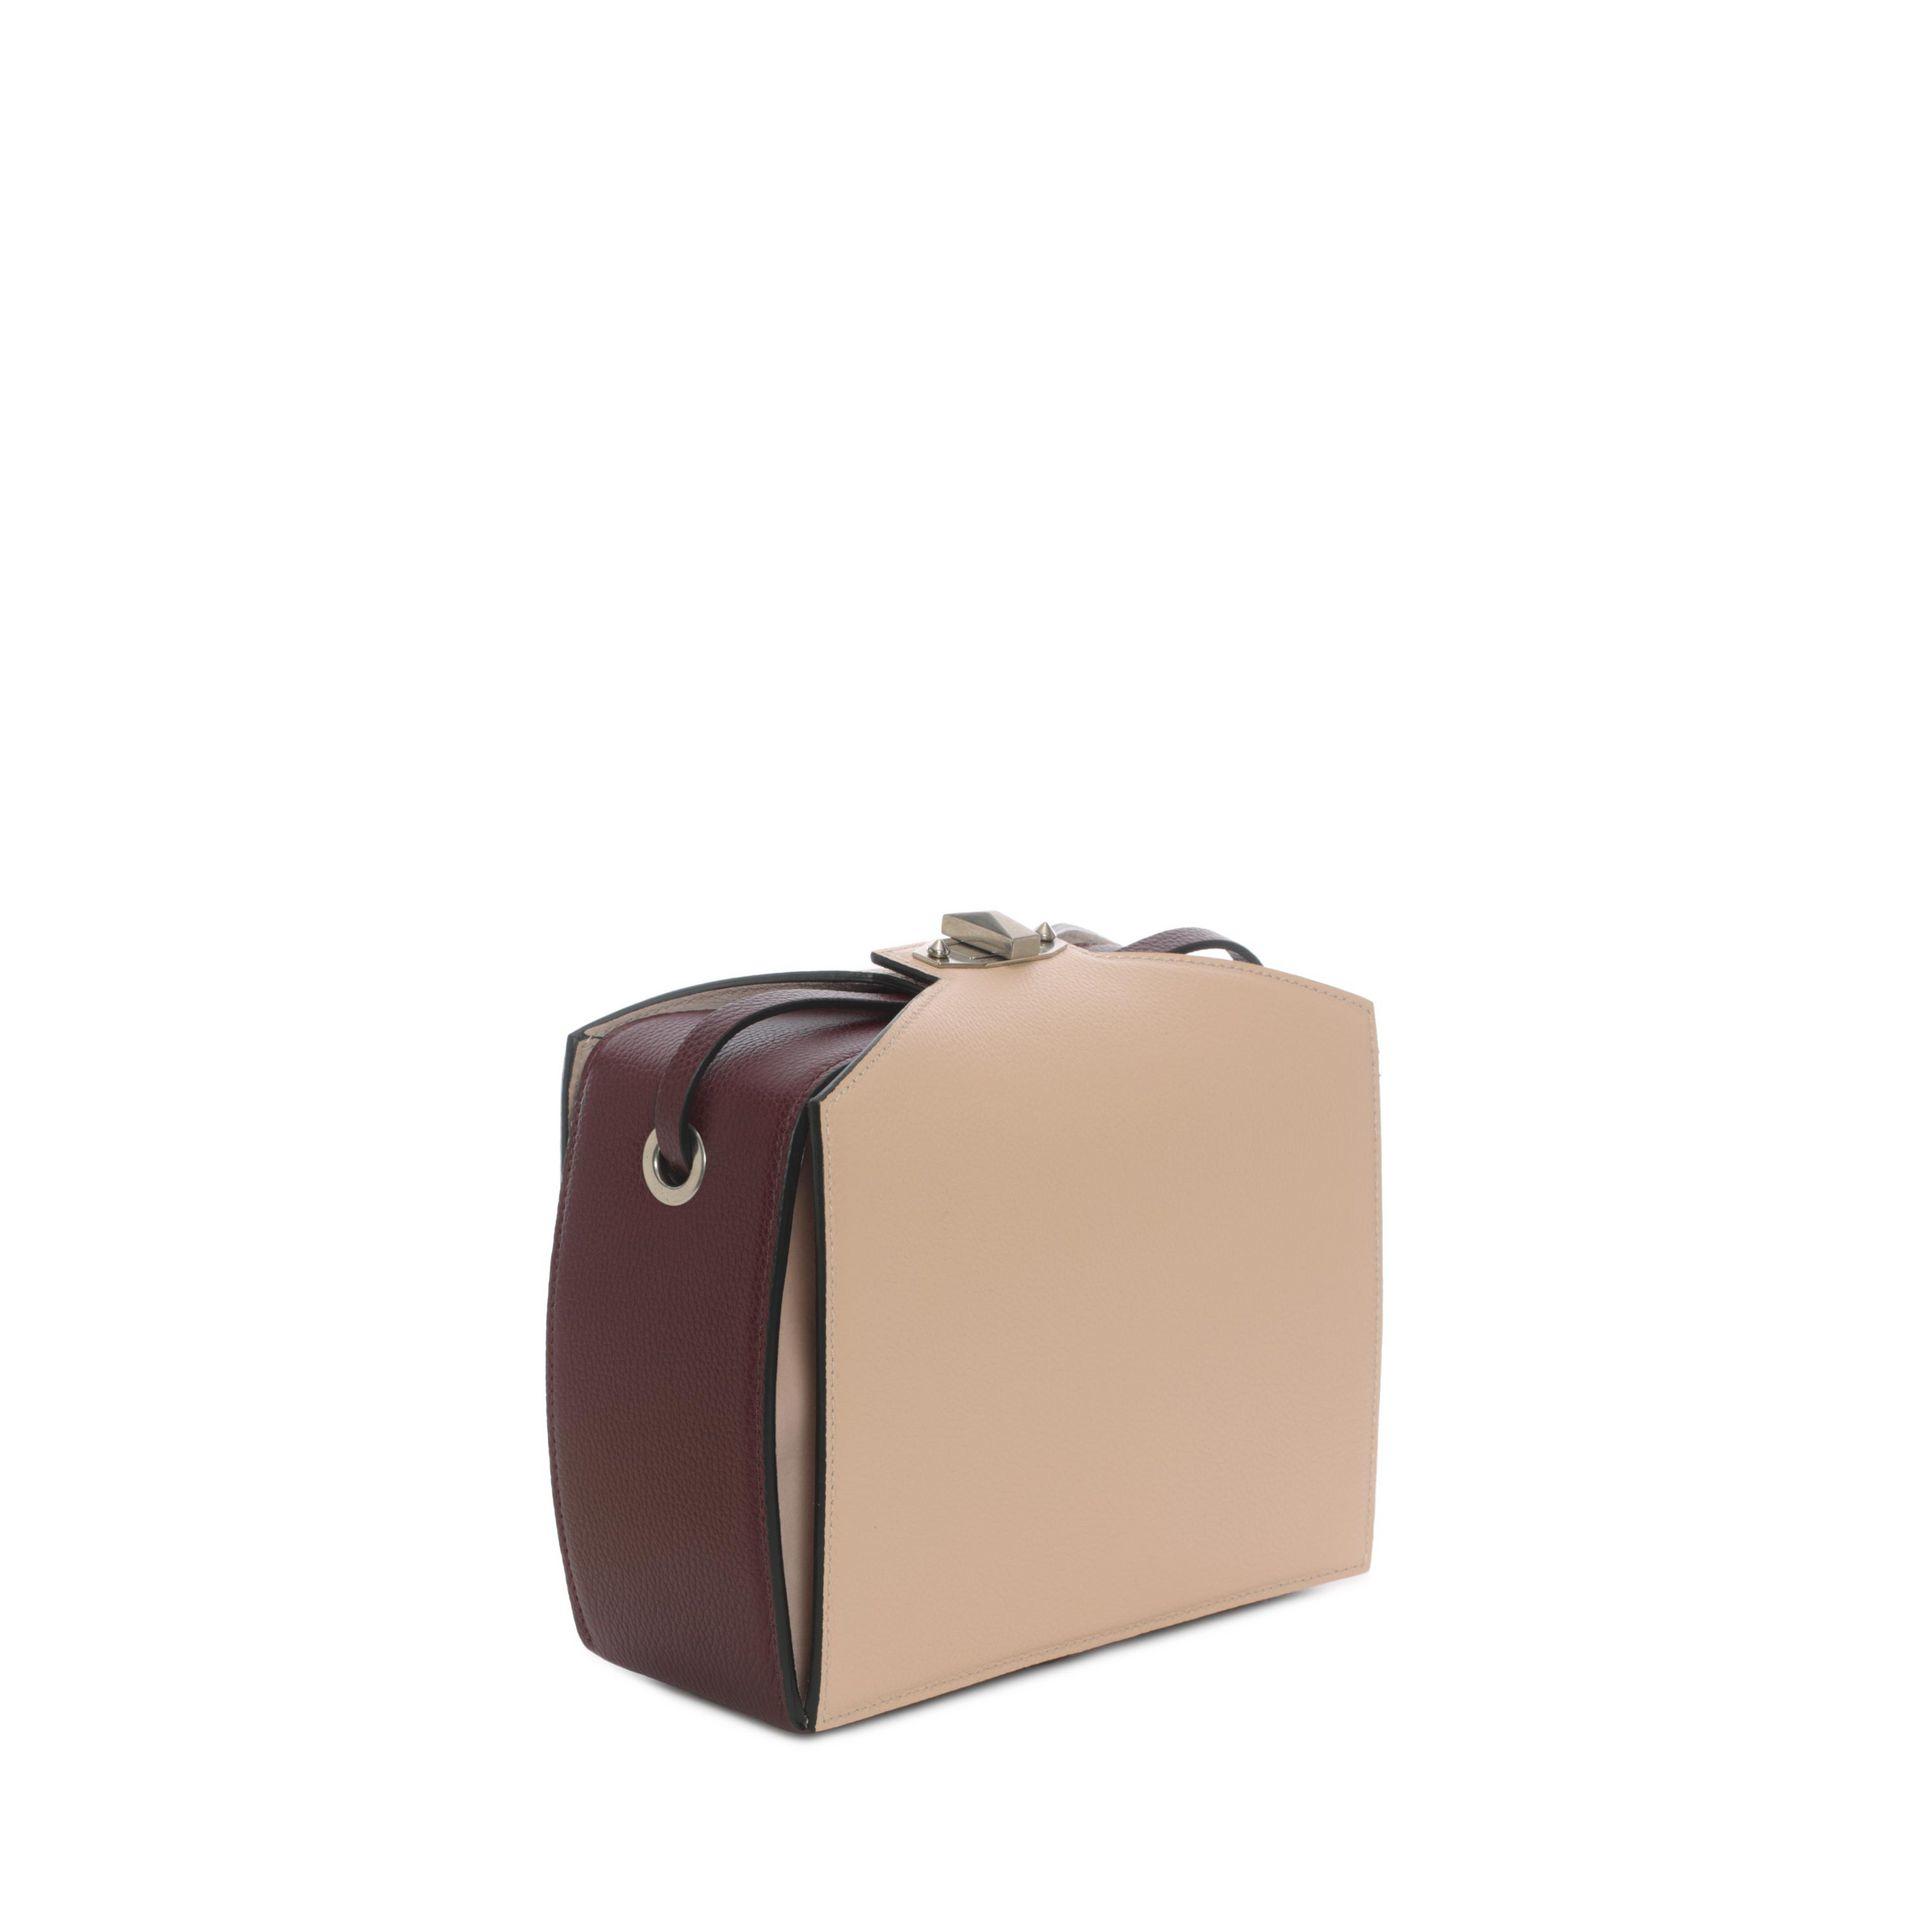 Alexander McQueen Grained Leather Shoulder Box Bag nHFRfcO84